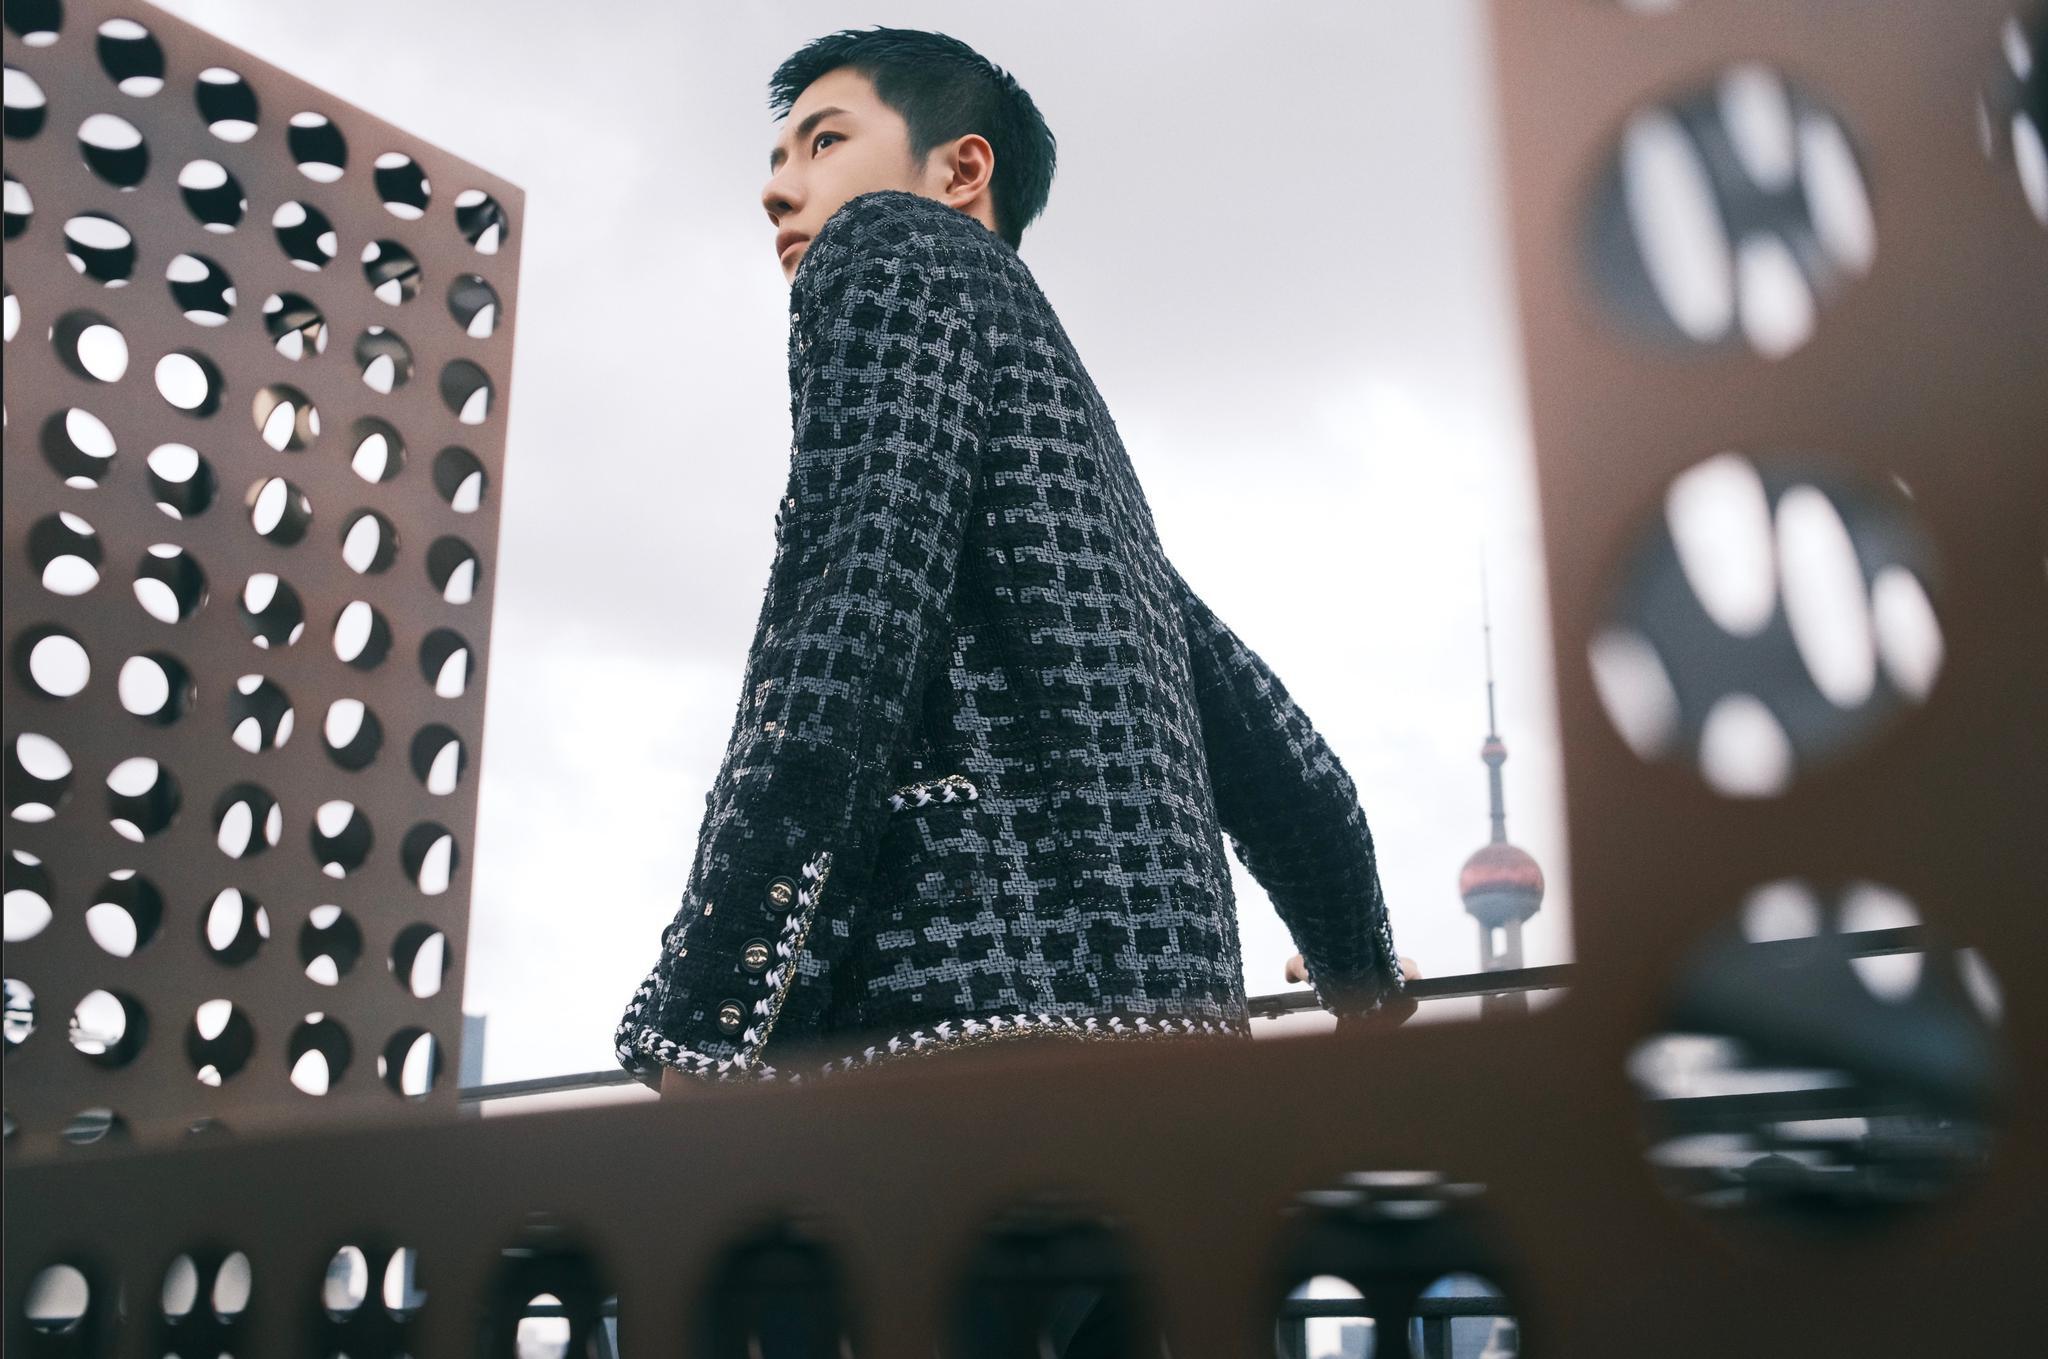 CHANEL 2.0造型释出,黑色亮片斜纹软呢外套搭配高级珠宝……